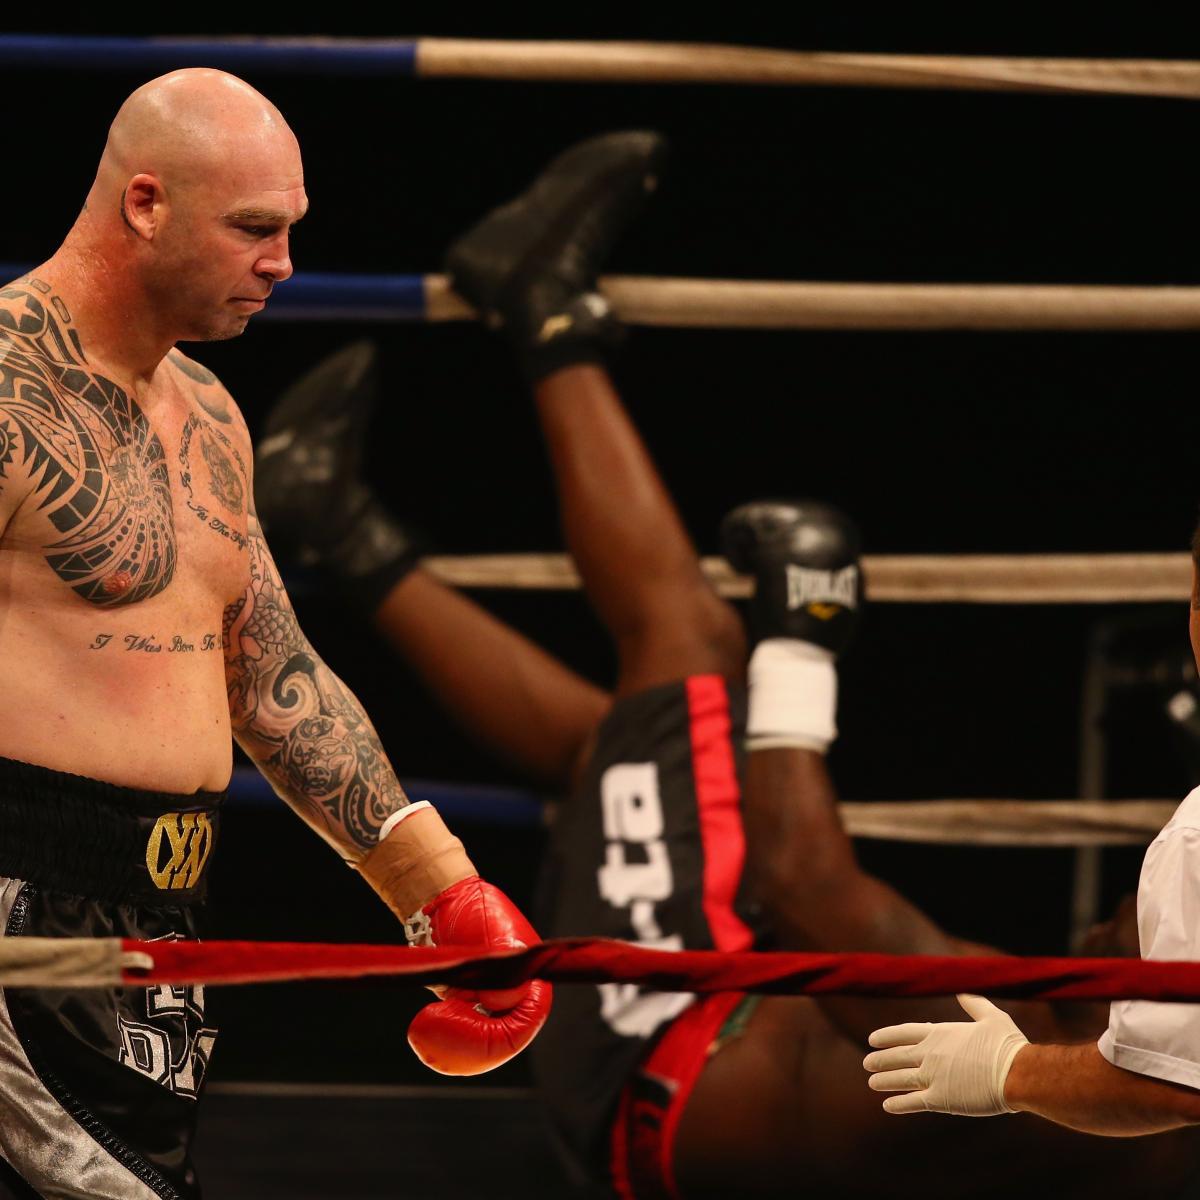 Lucas Browne Vs. Eric Martel Bahoeli: Fight Time, Date